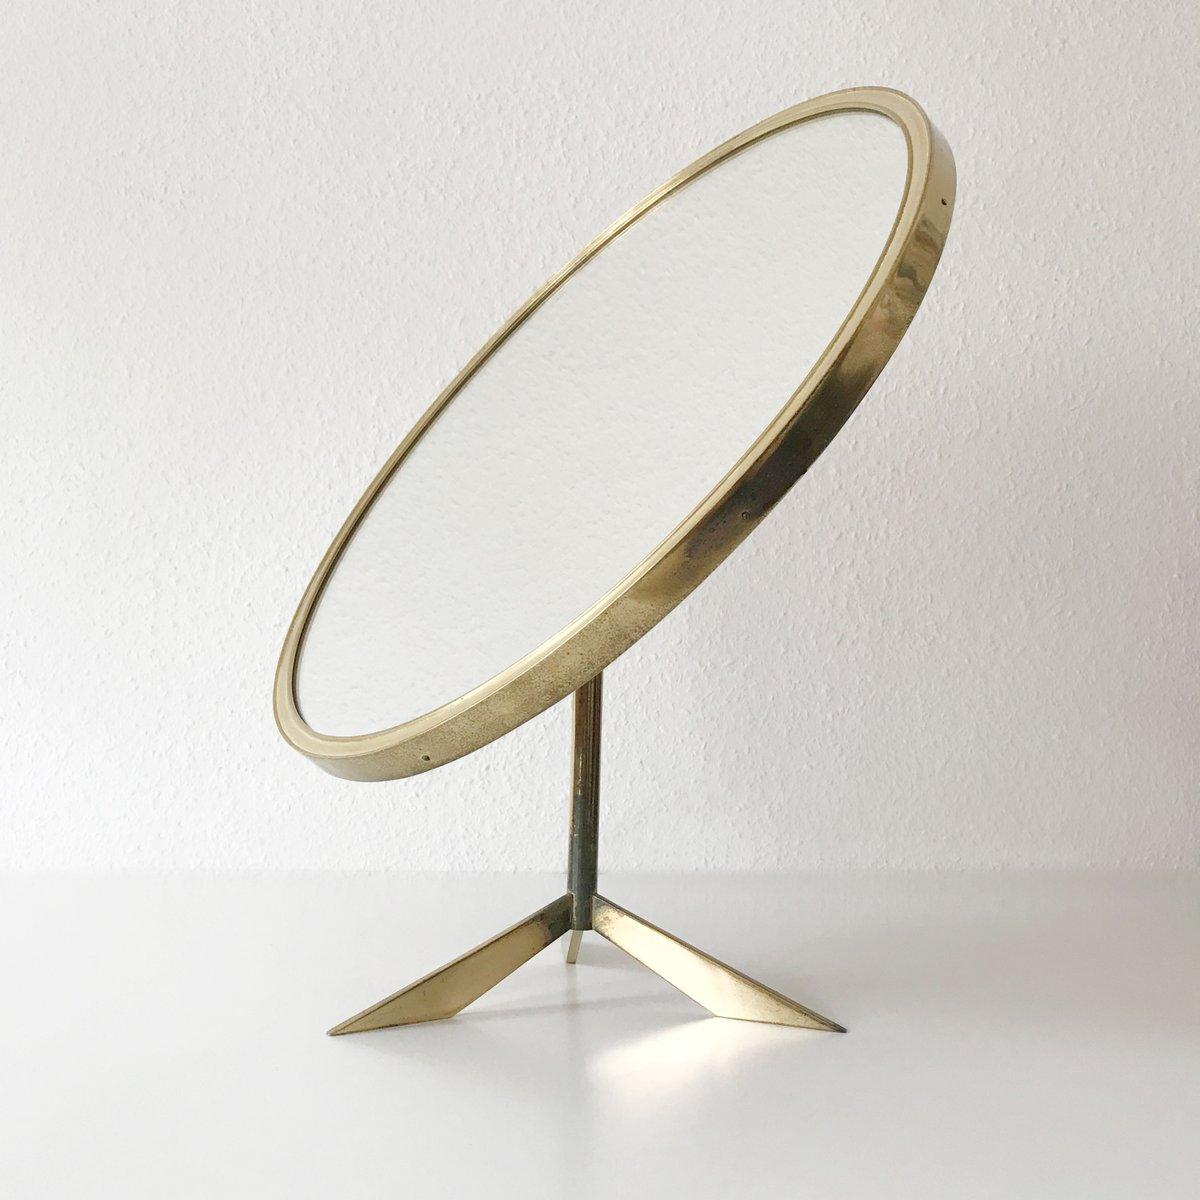 grand miroir poser mid century de vereinigte werkst tten 1950s en vente sur pamono. Black Bedroom Furniture Sets. Home Design Ideas